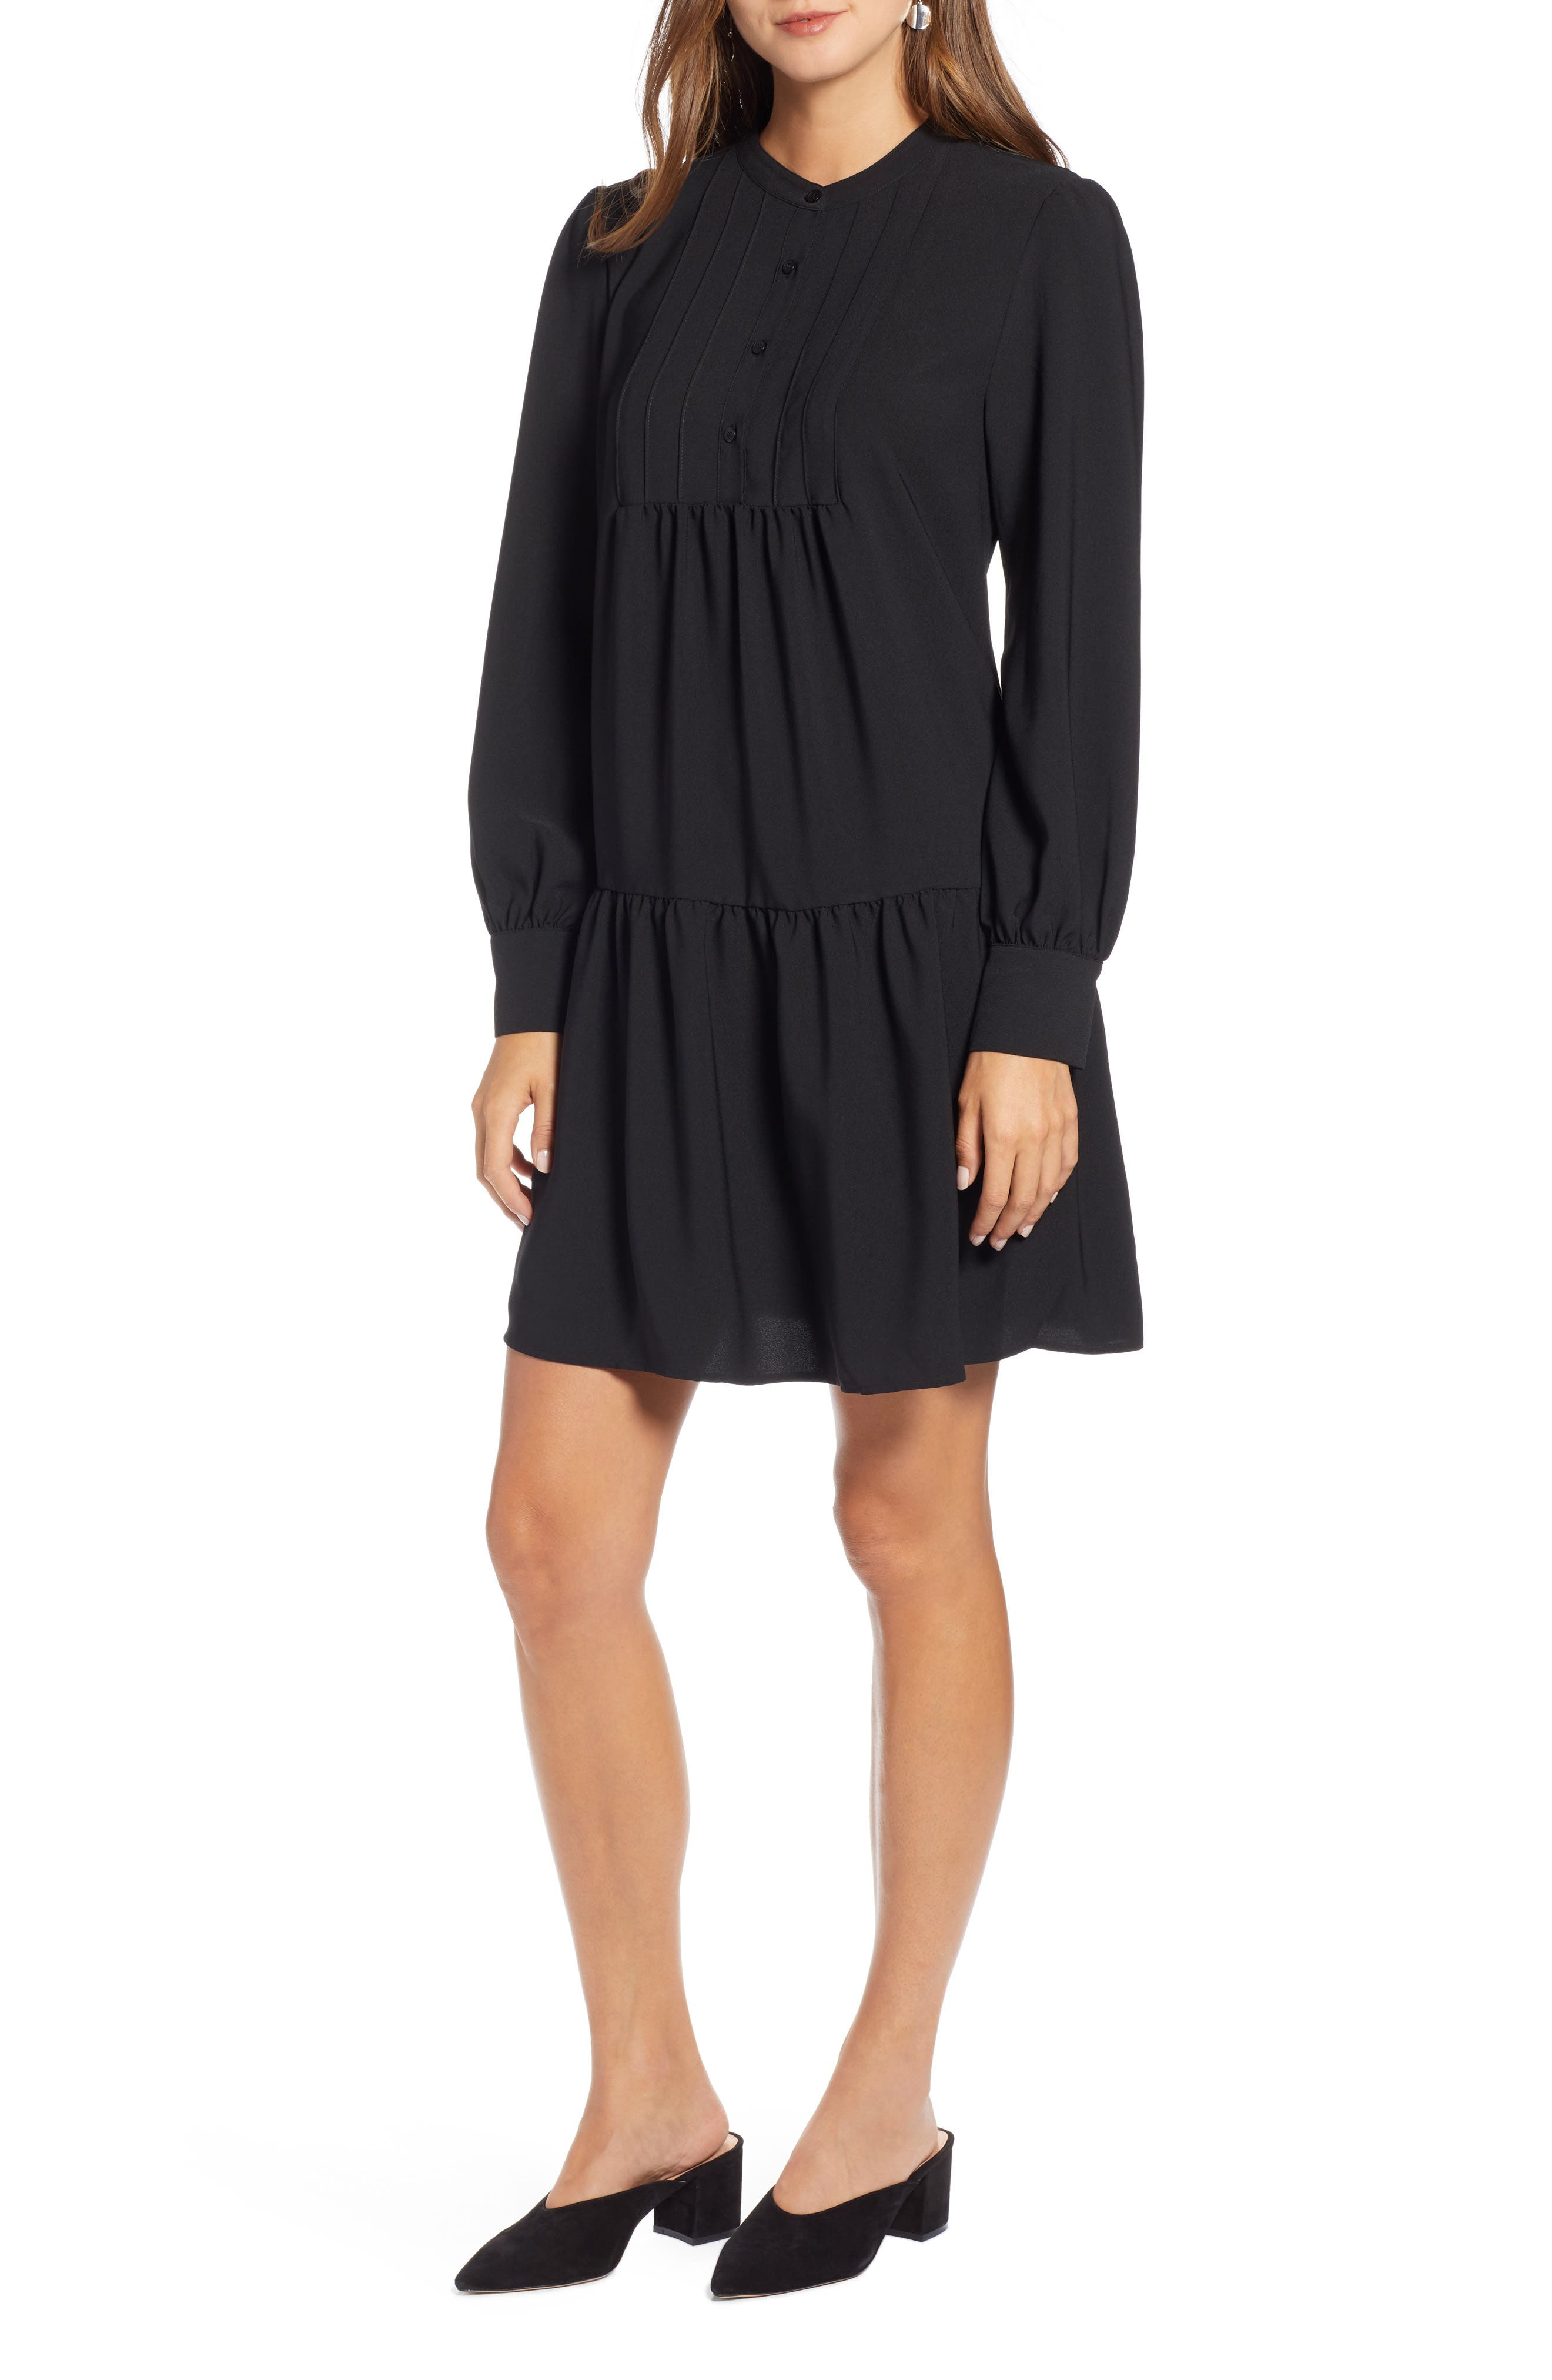 Petite Halogen Pintuck Detail Shift Dress, Black